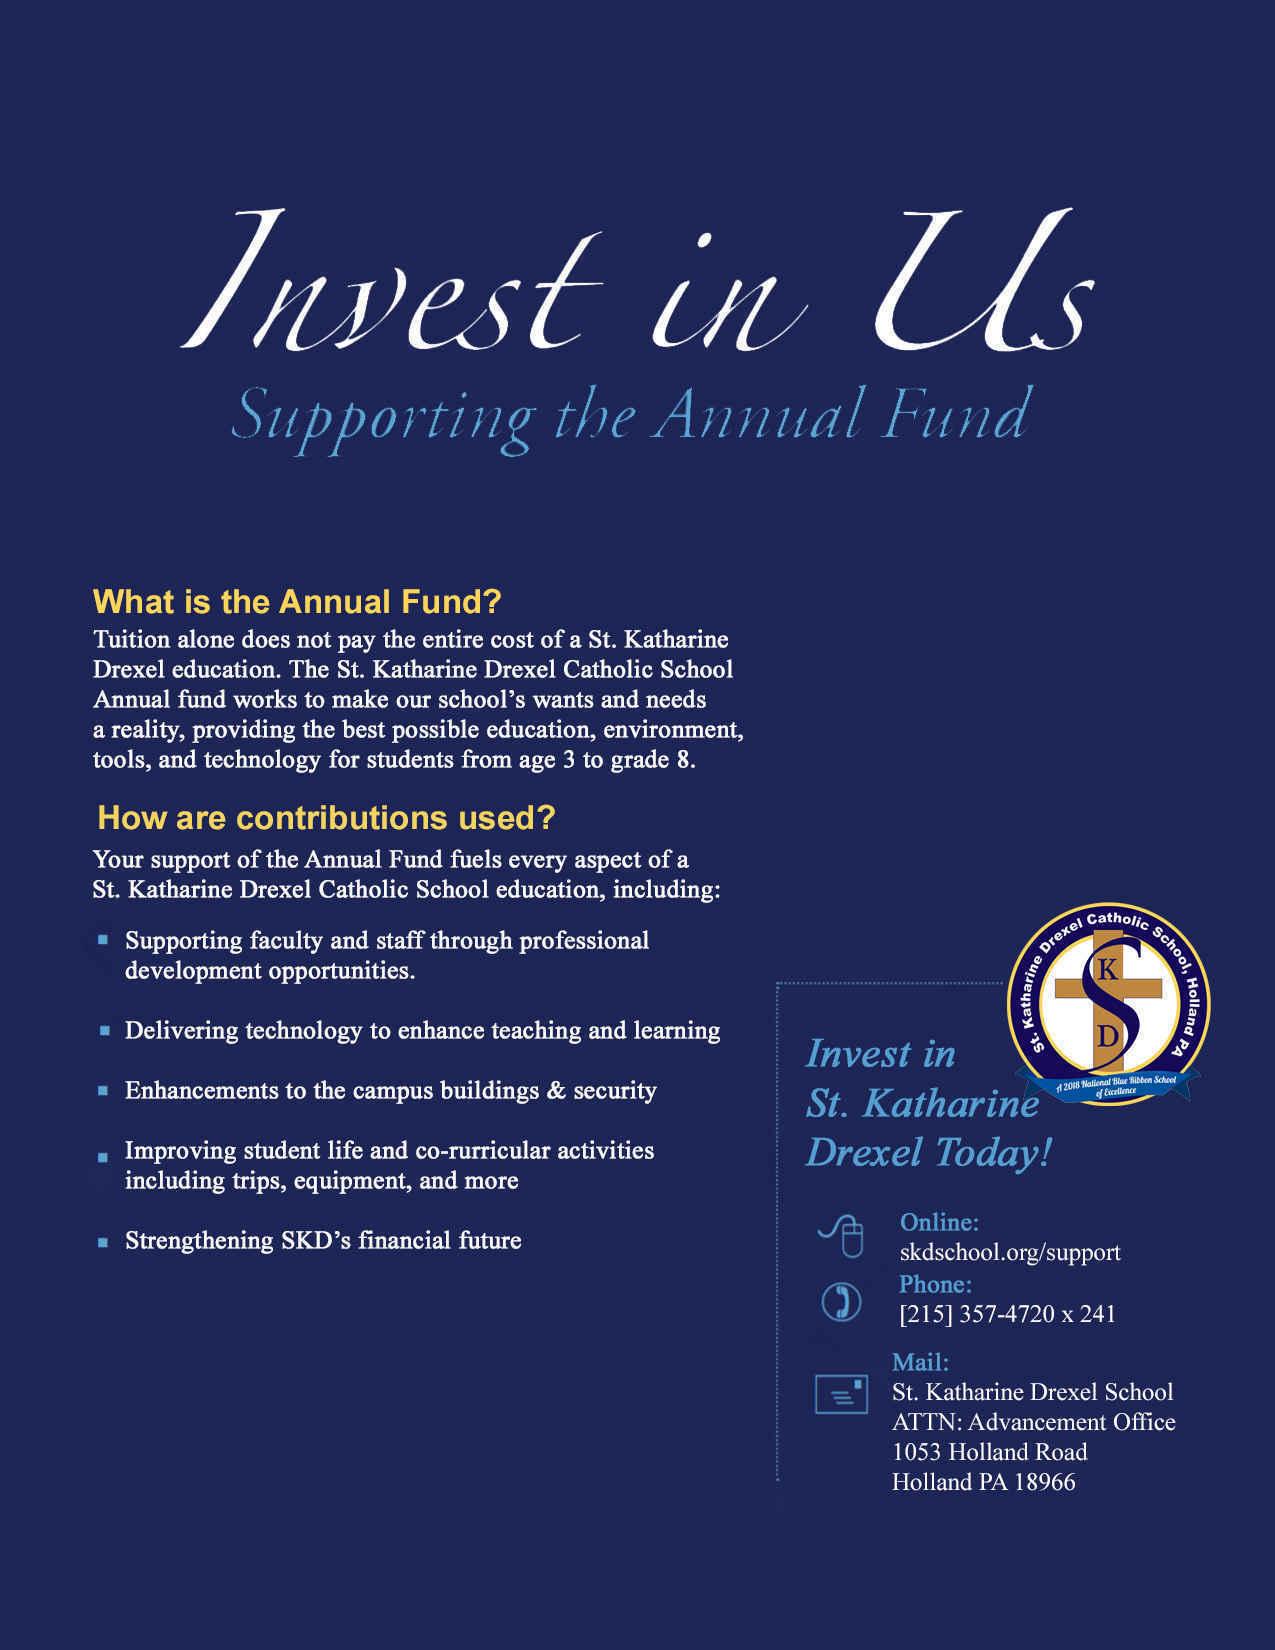 2019-2020 Annual Fund image